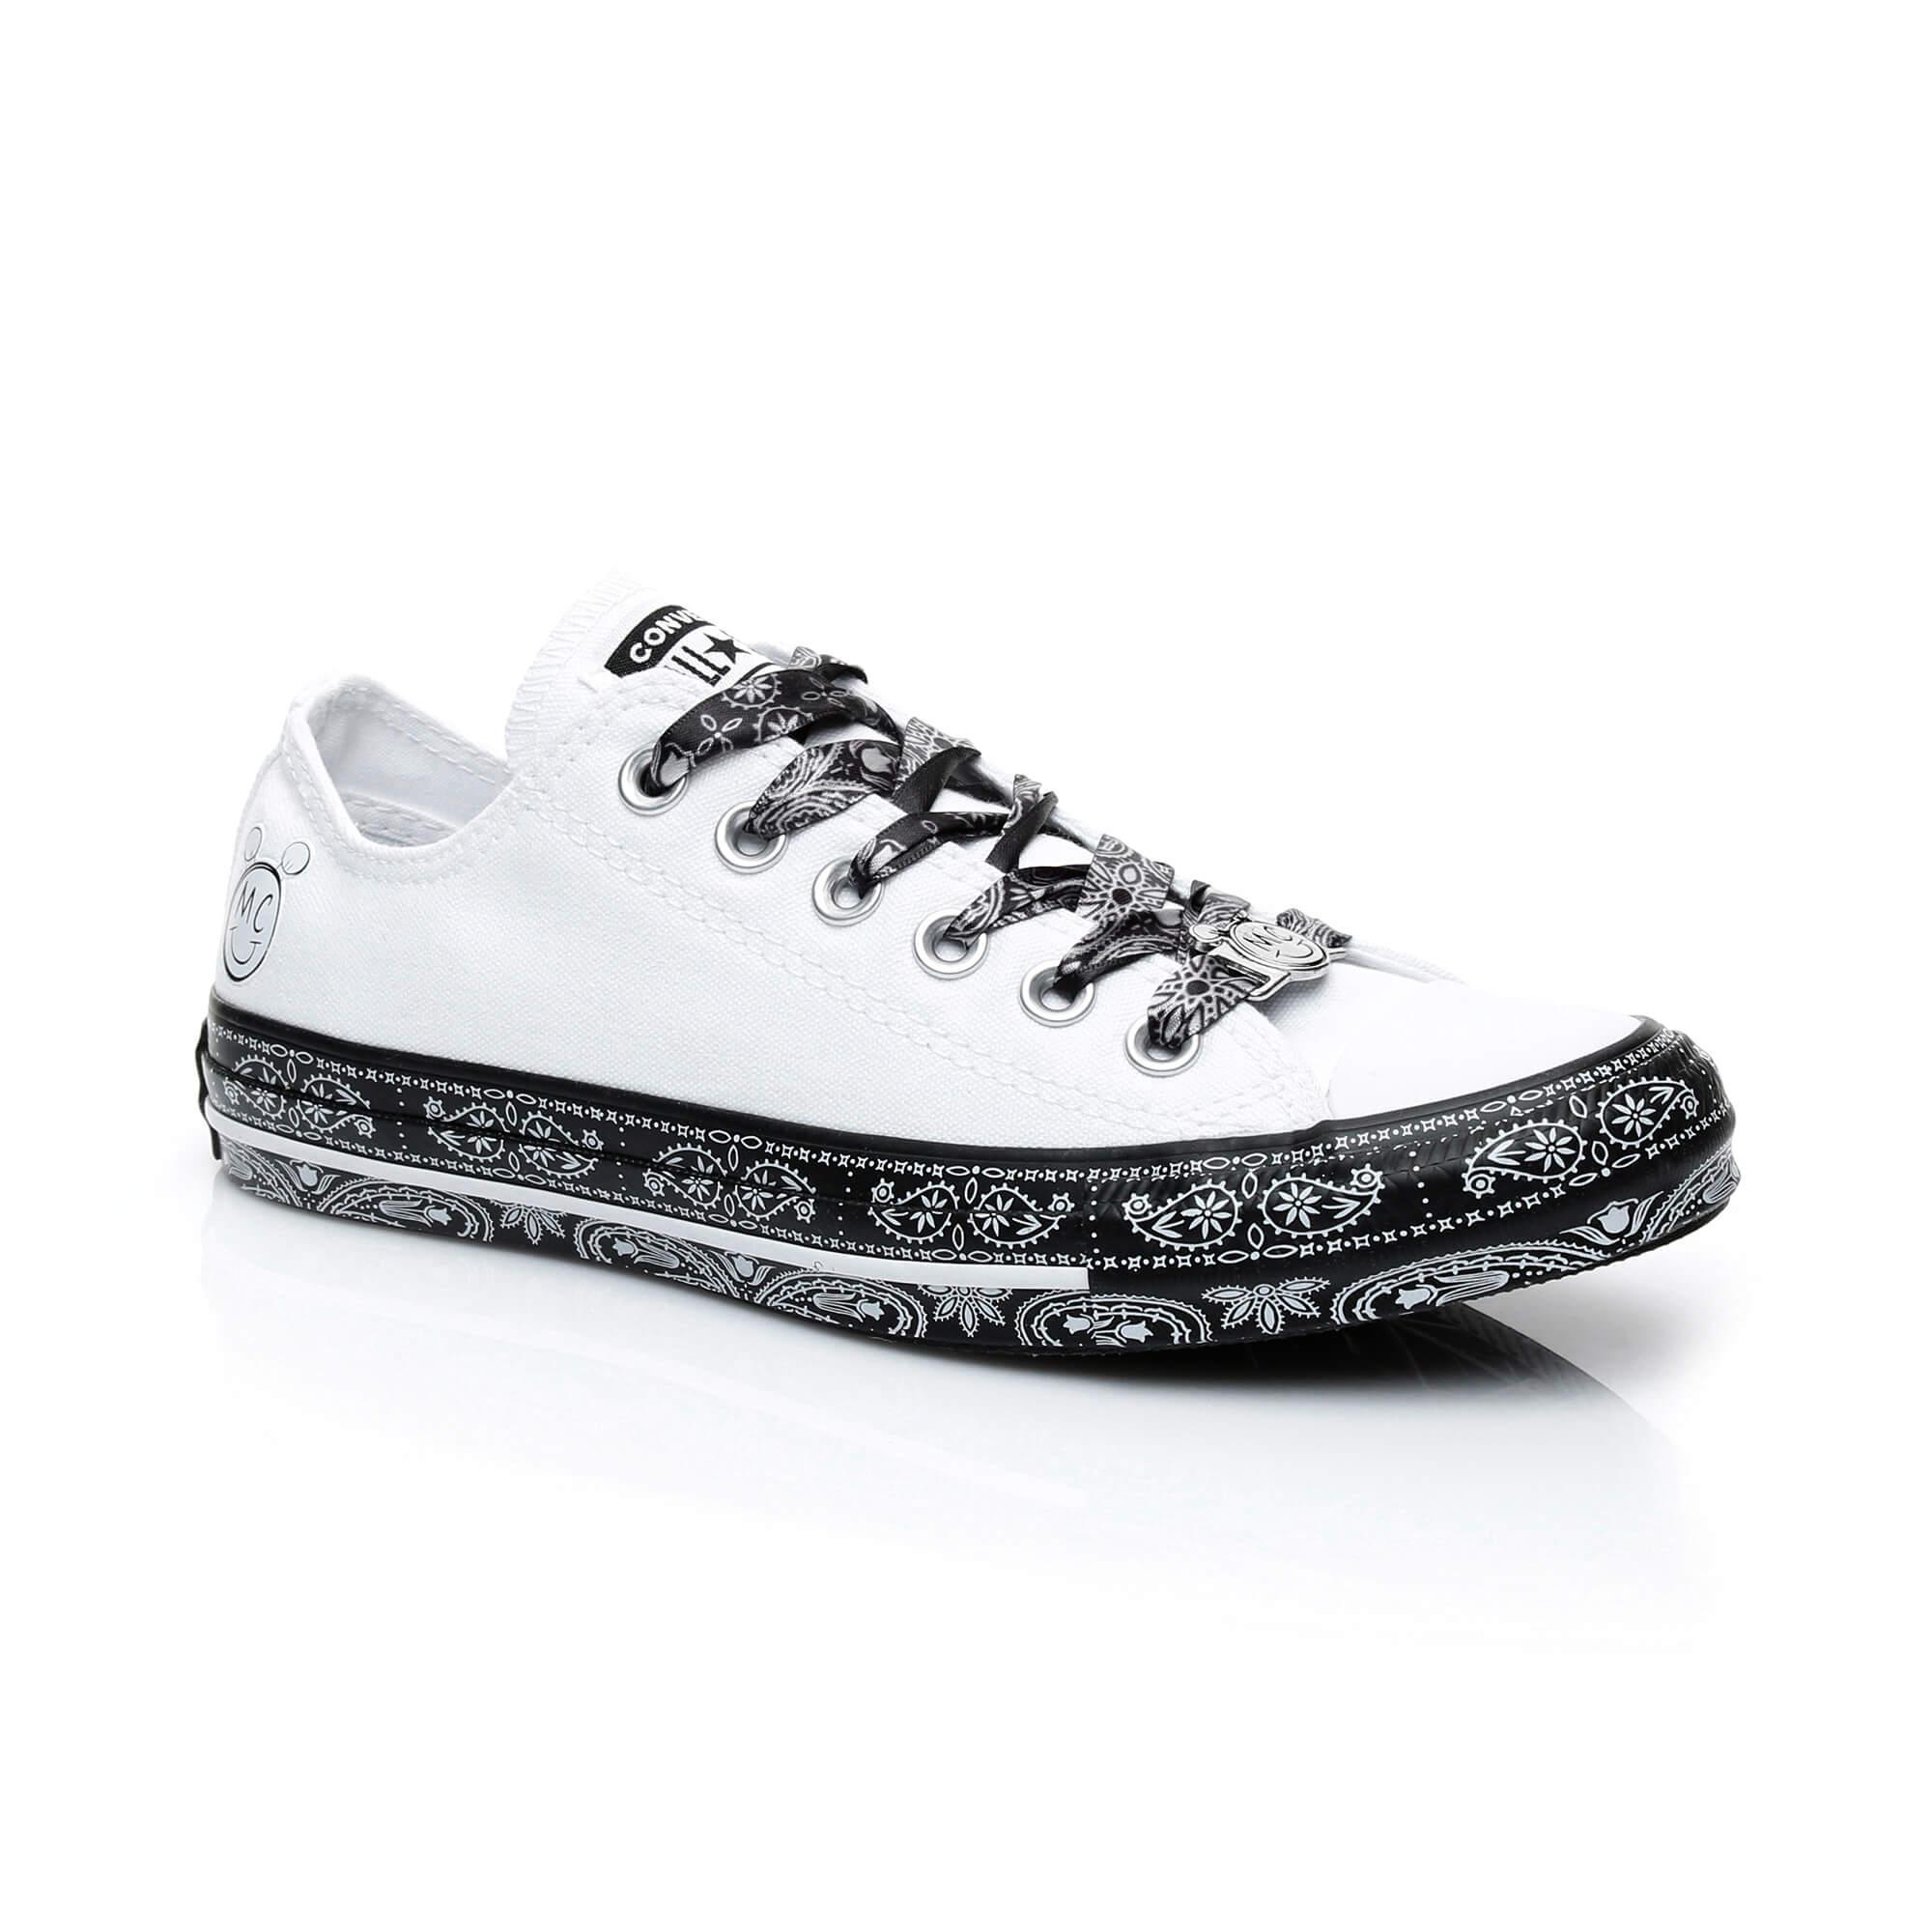 Converse X Miley Cyrus Chuck Taylor All Star ''Bandana'' Kadın Beyaz Sneaker